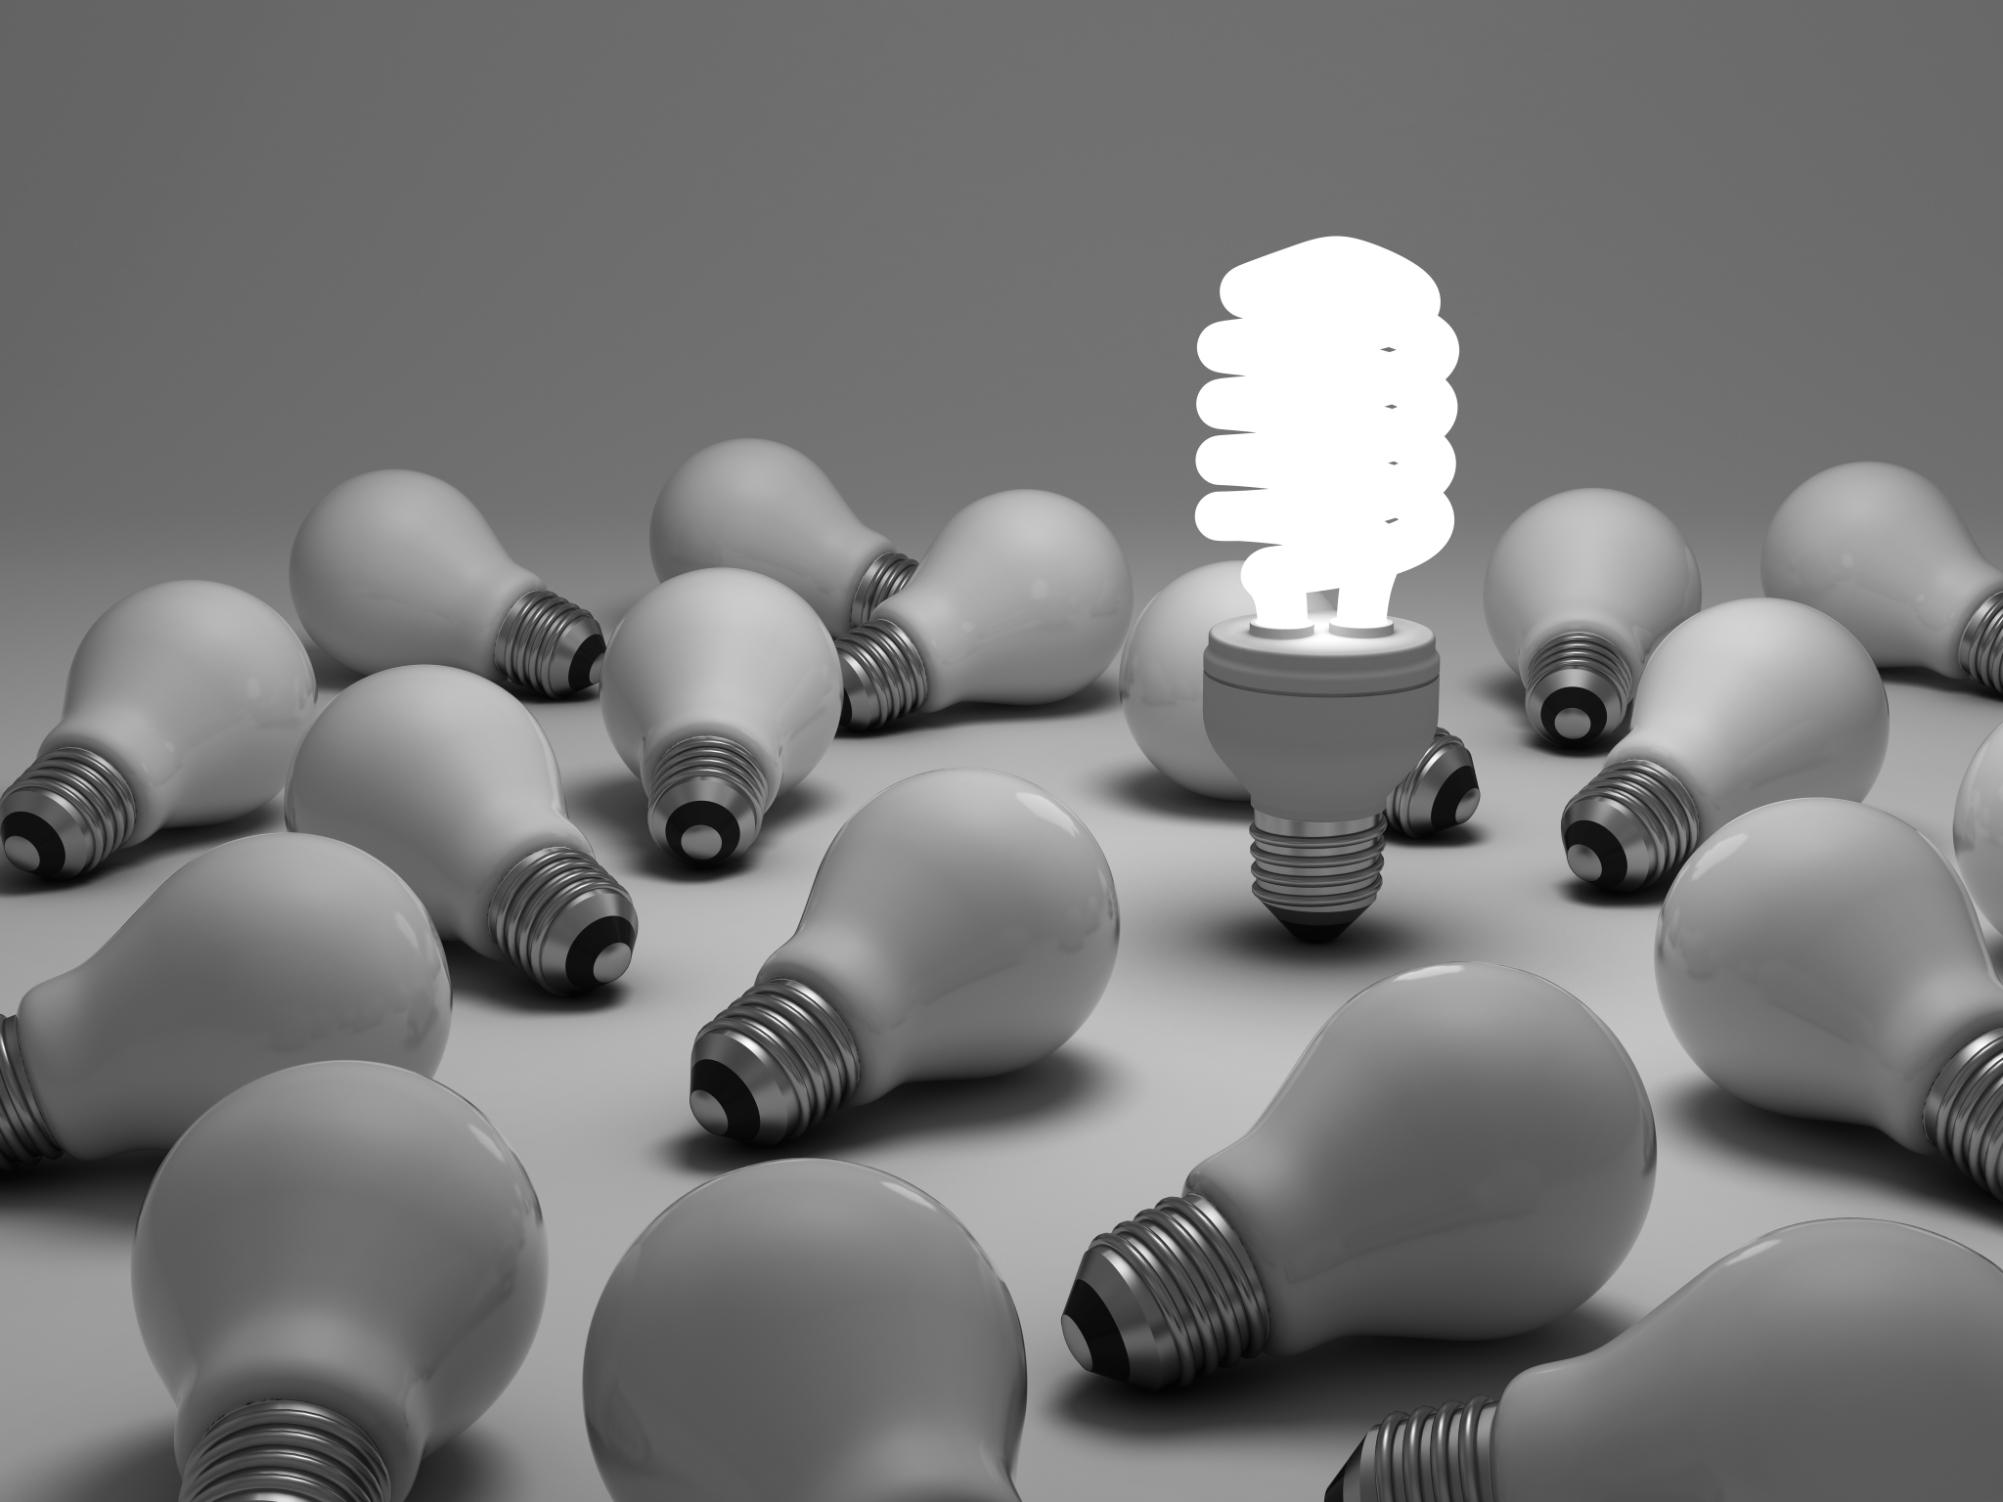 single lightbulb on